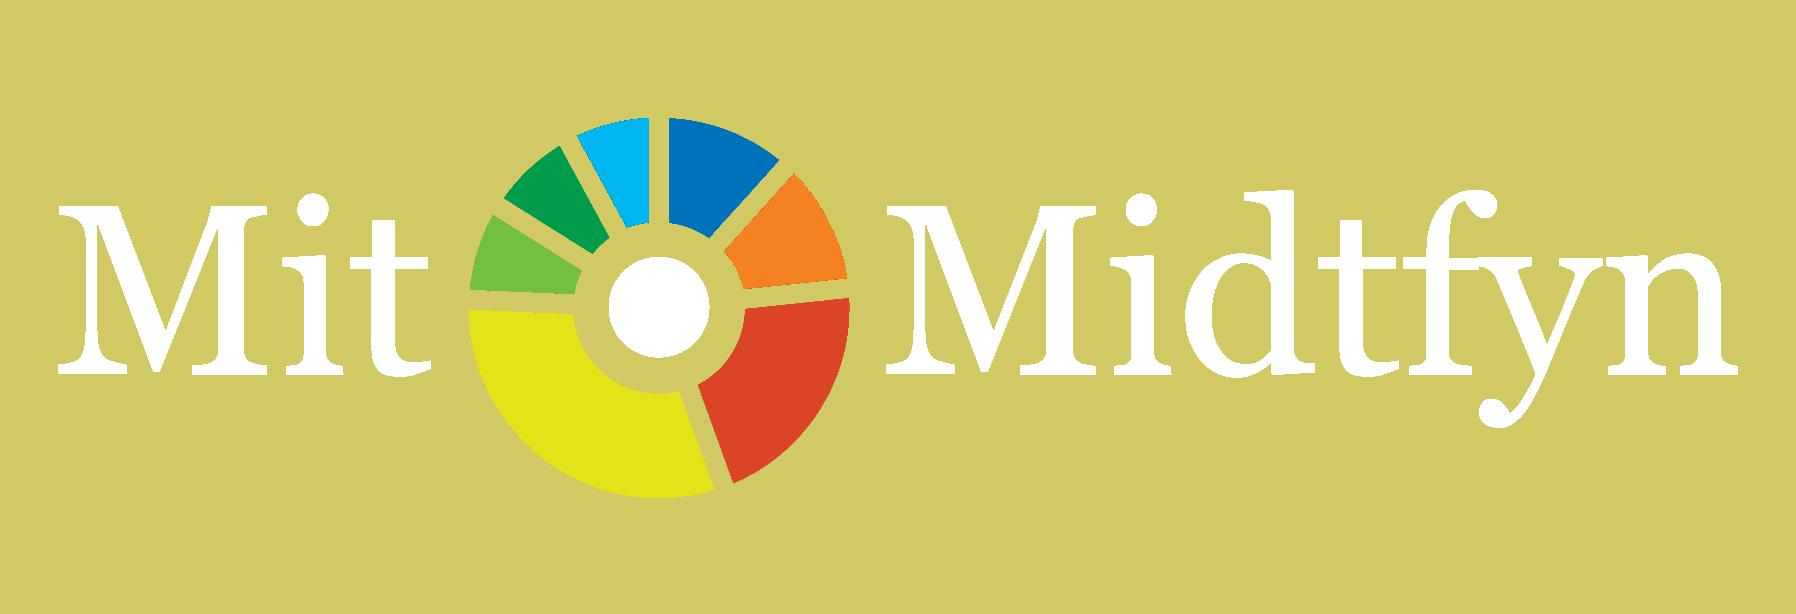 Mit Midtfyn